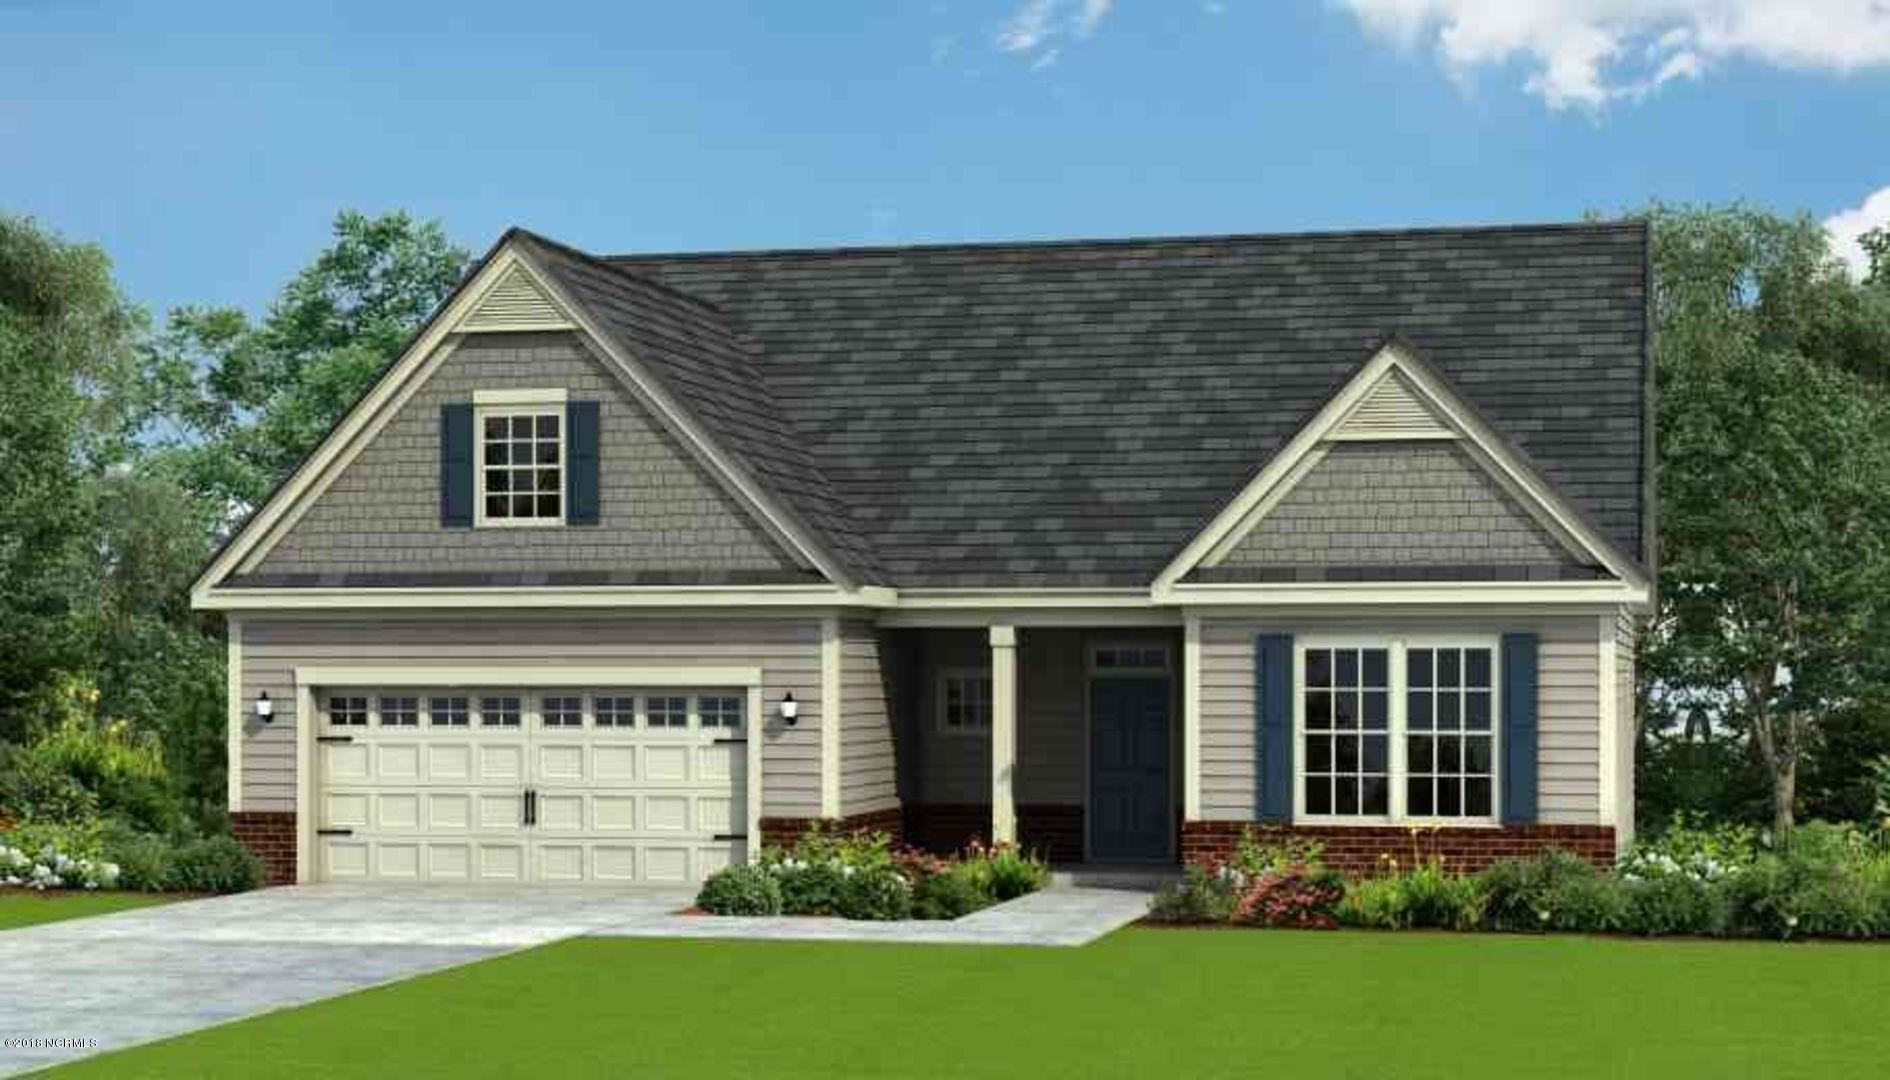 Photo of 1155 Carteret Manor Drive, Jacksonville, NC 28546 (MLS # 100295811)